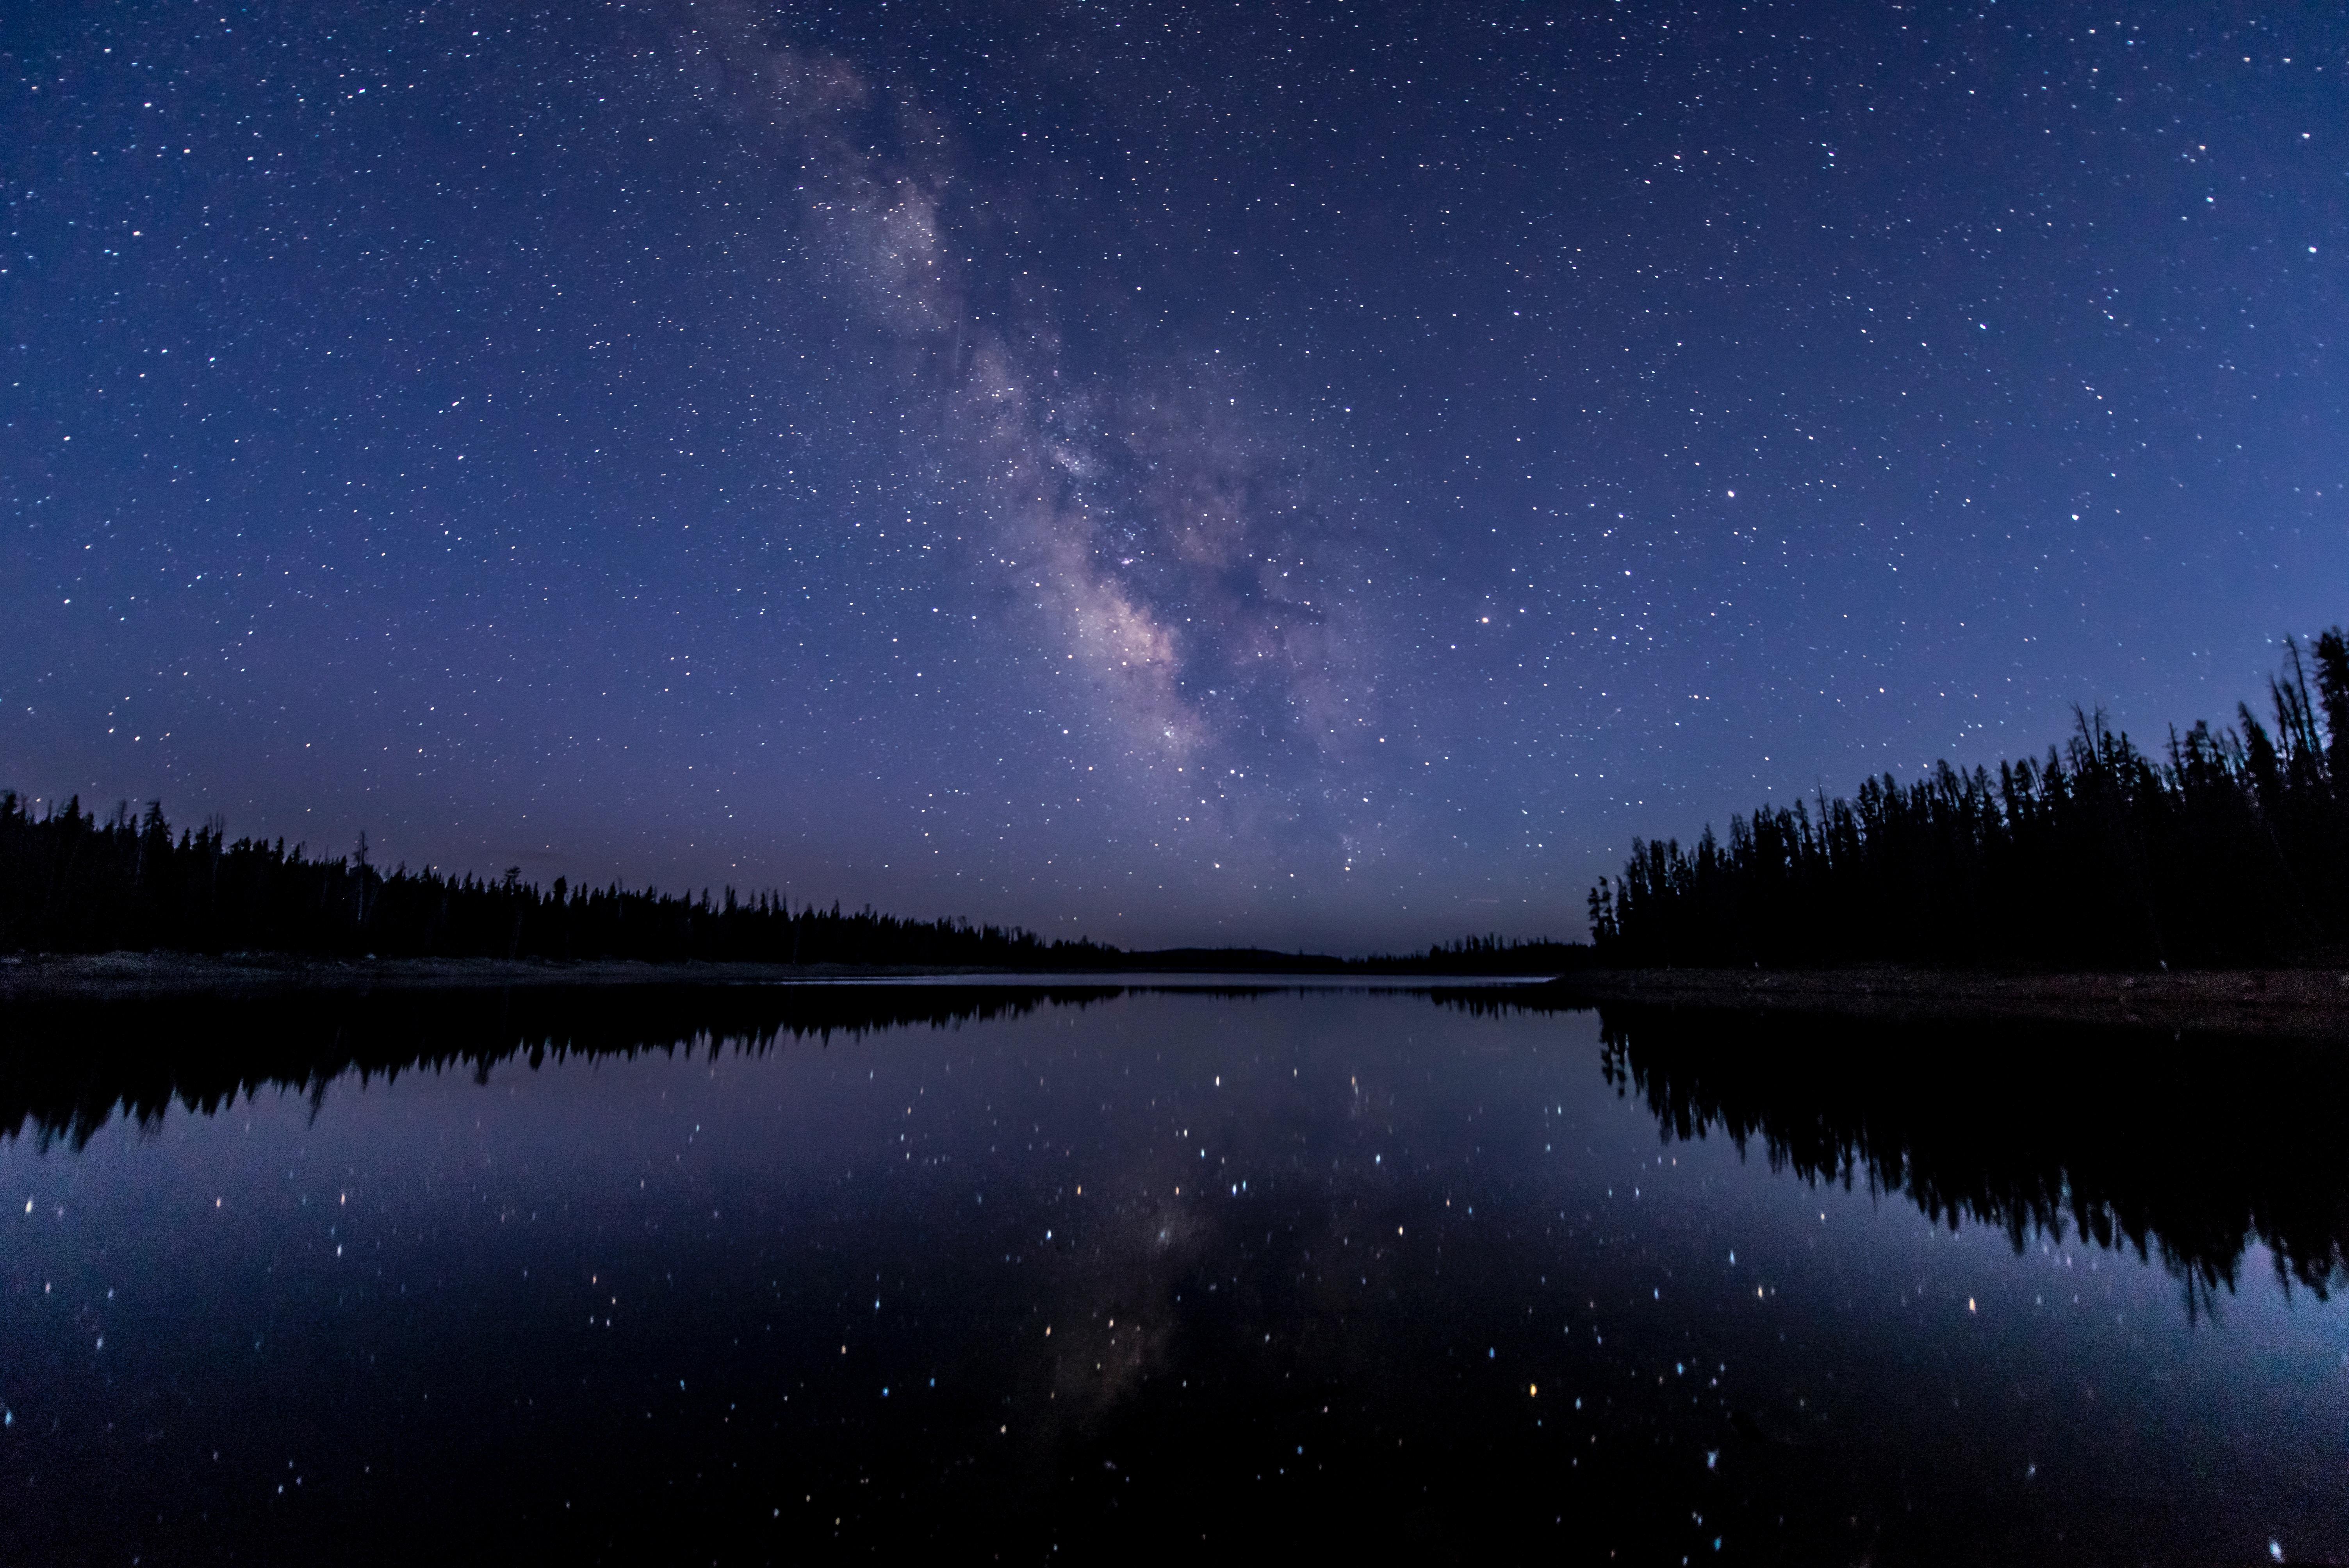 Wallpaper : night sky, stars, starry sky 6016x4016 ...